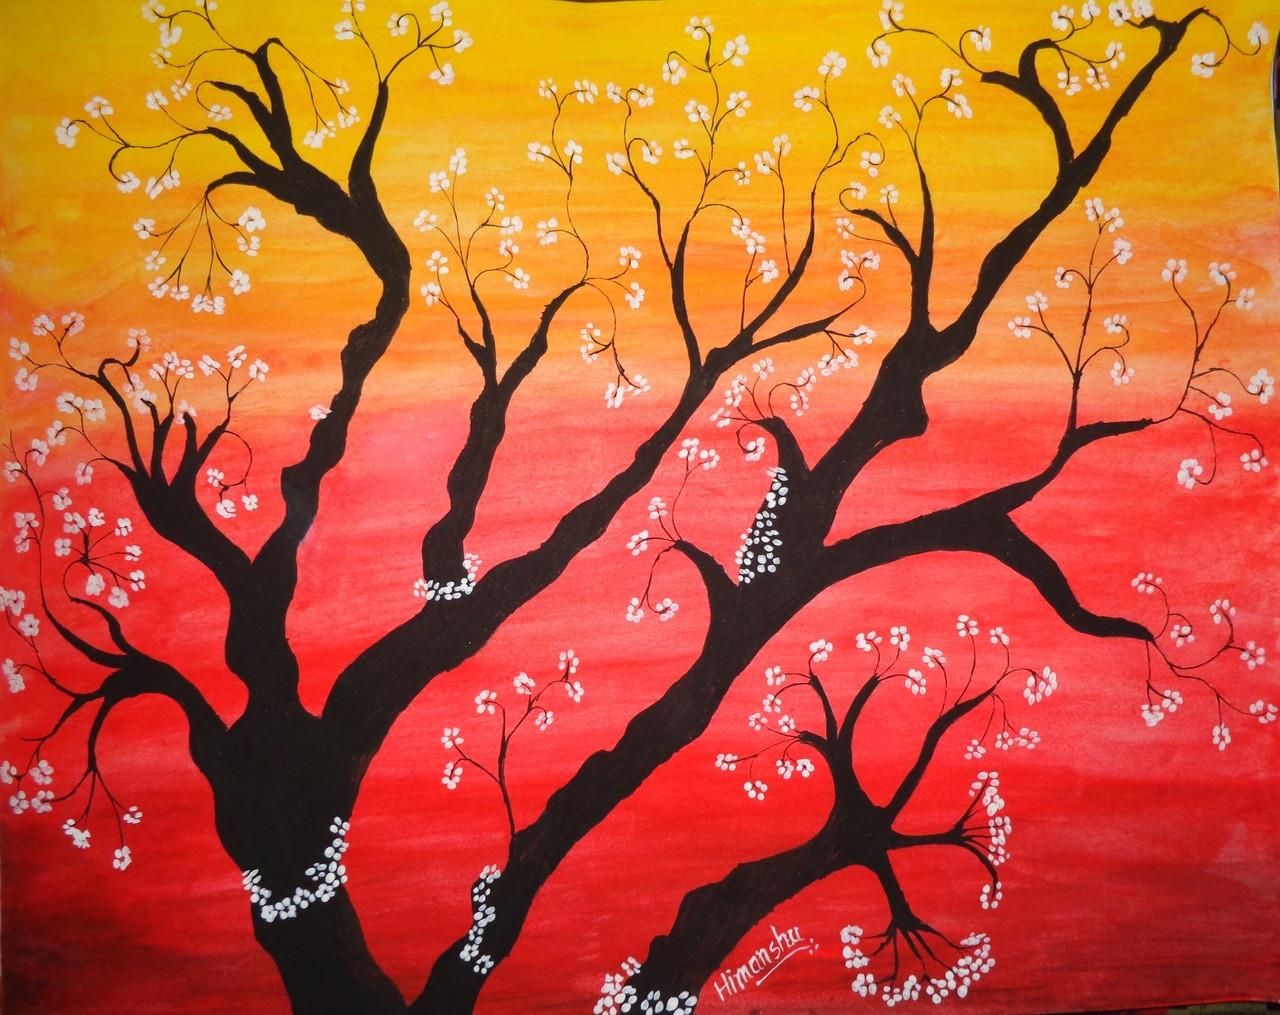 the tree art 2540